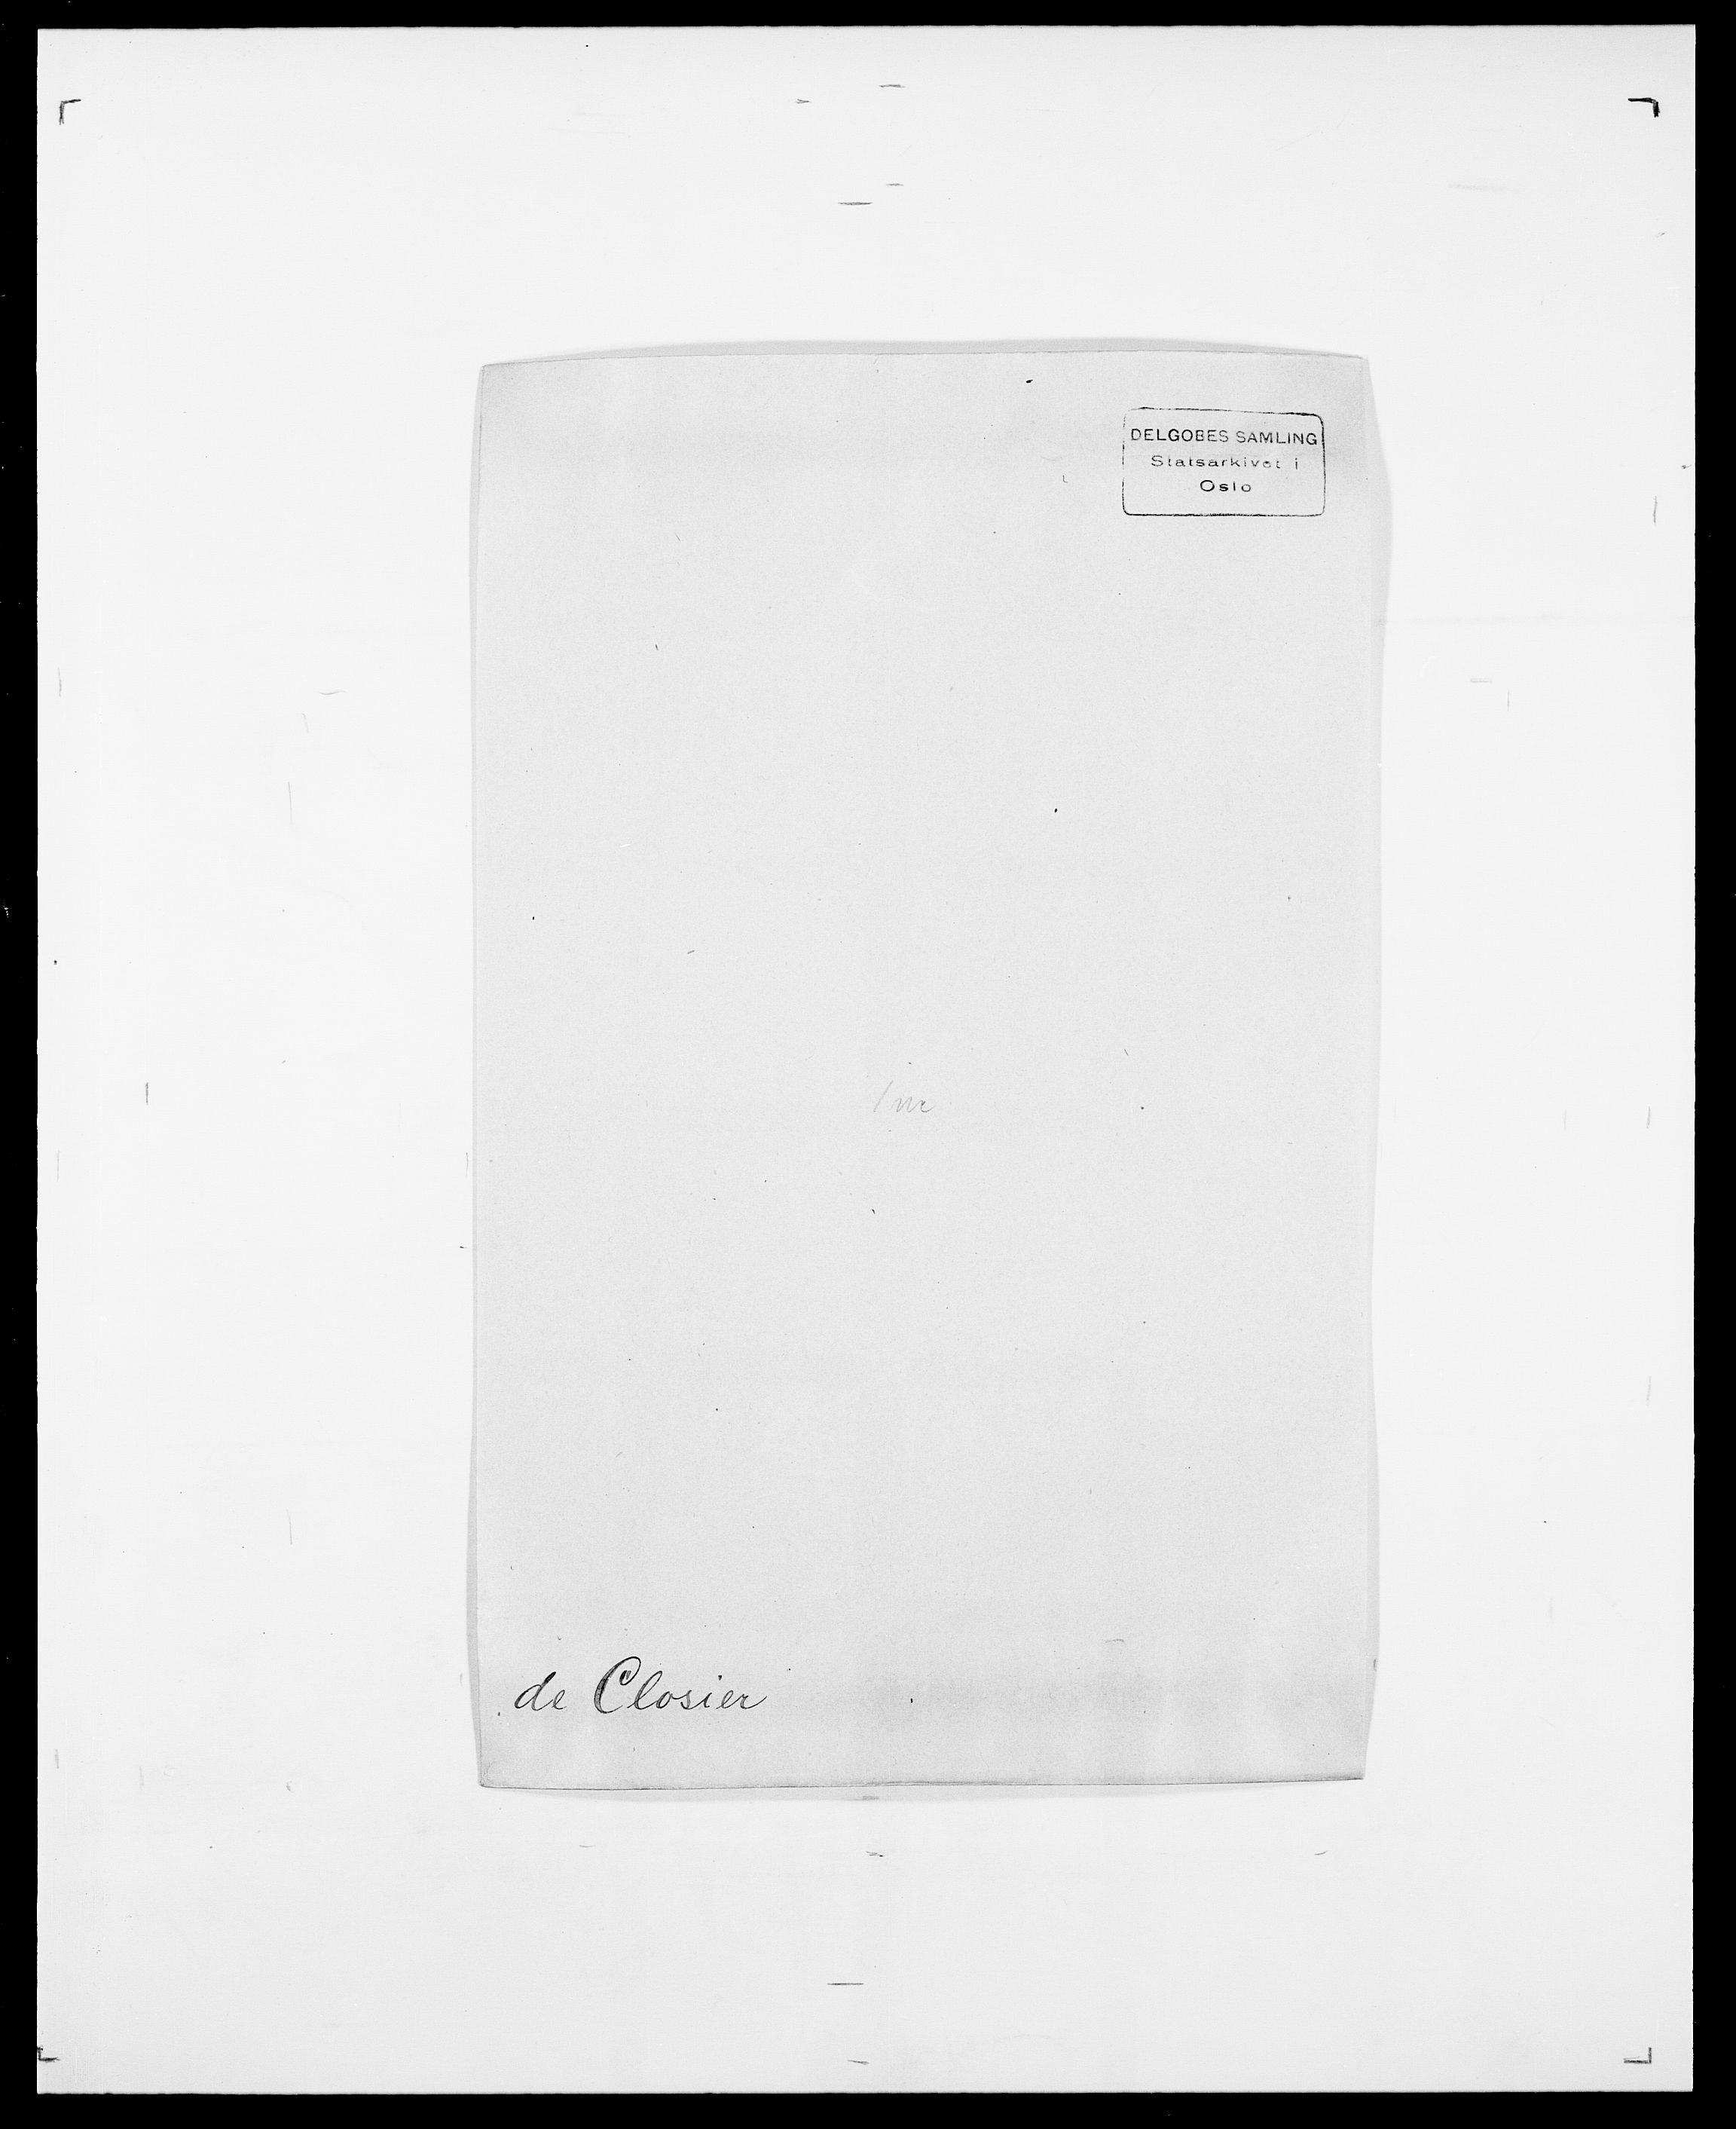 SAO, Delgobe, Charles Antoine - samling, D/Da/L0008: Capjon - Dagenbolt, s. 387